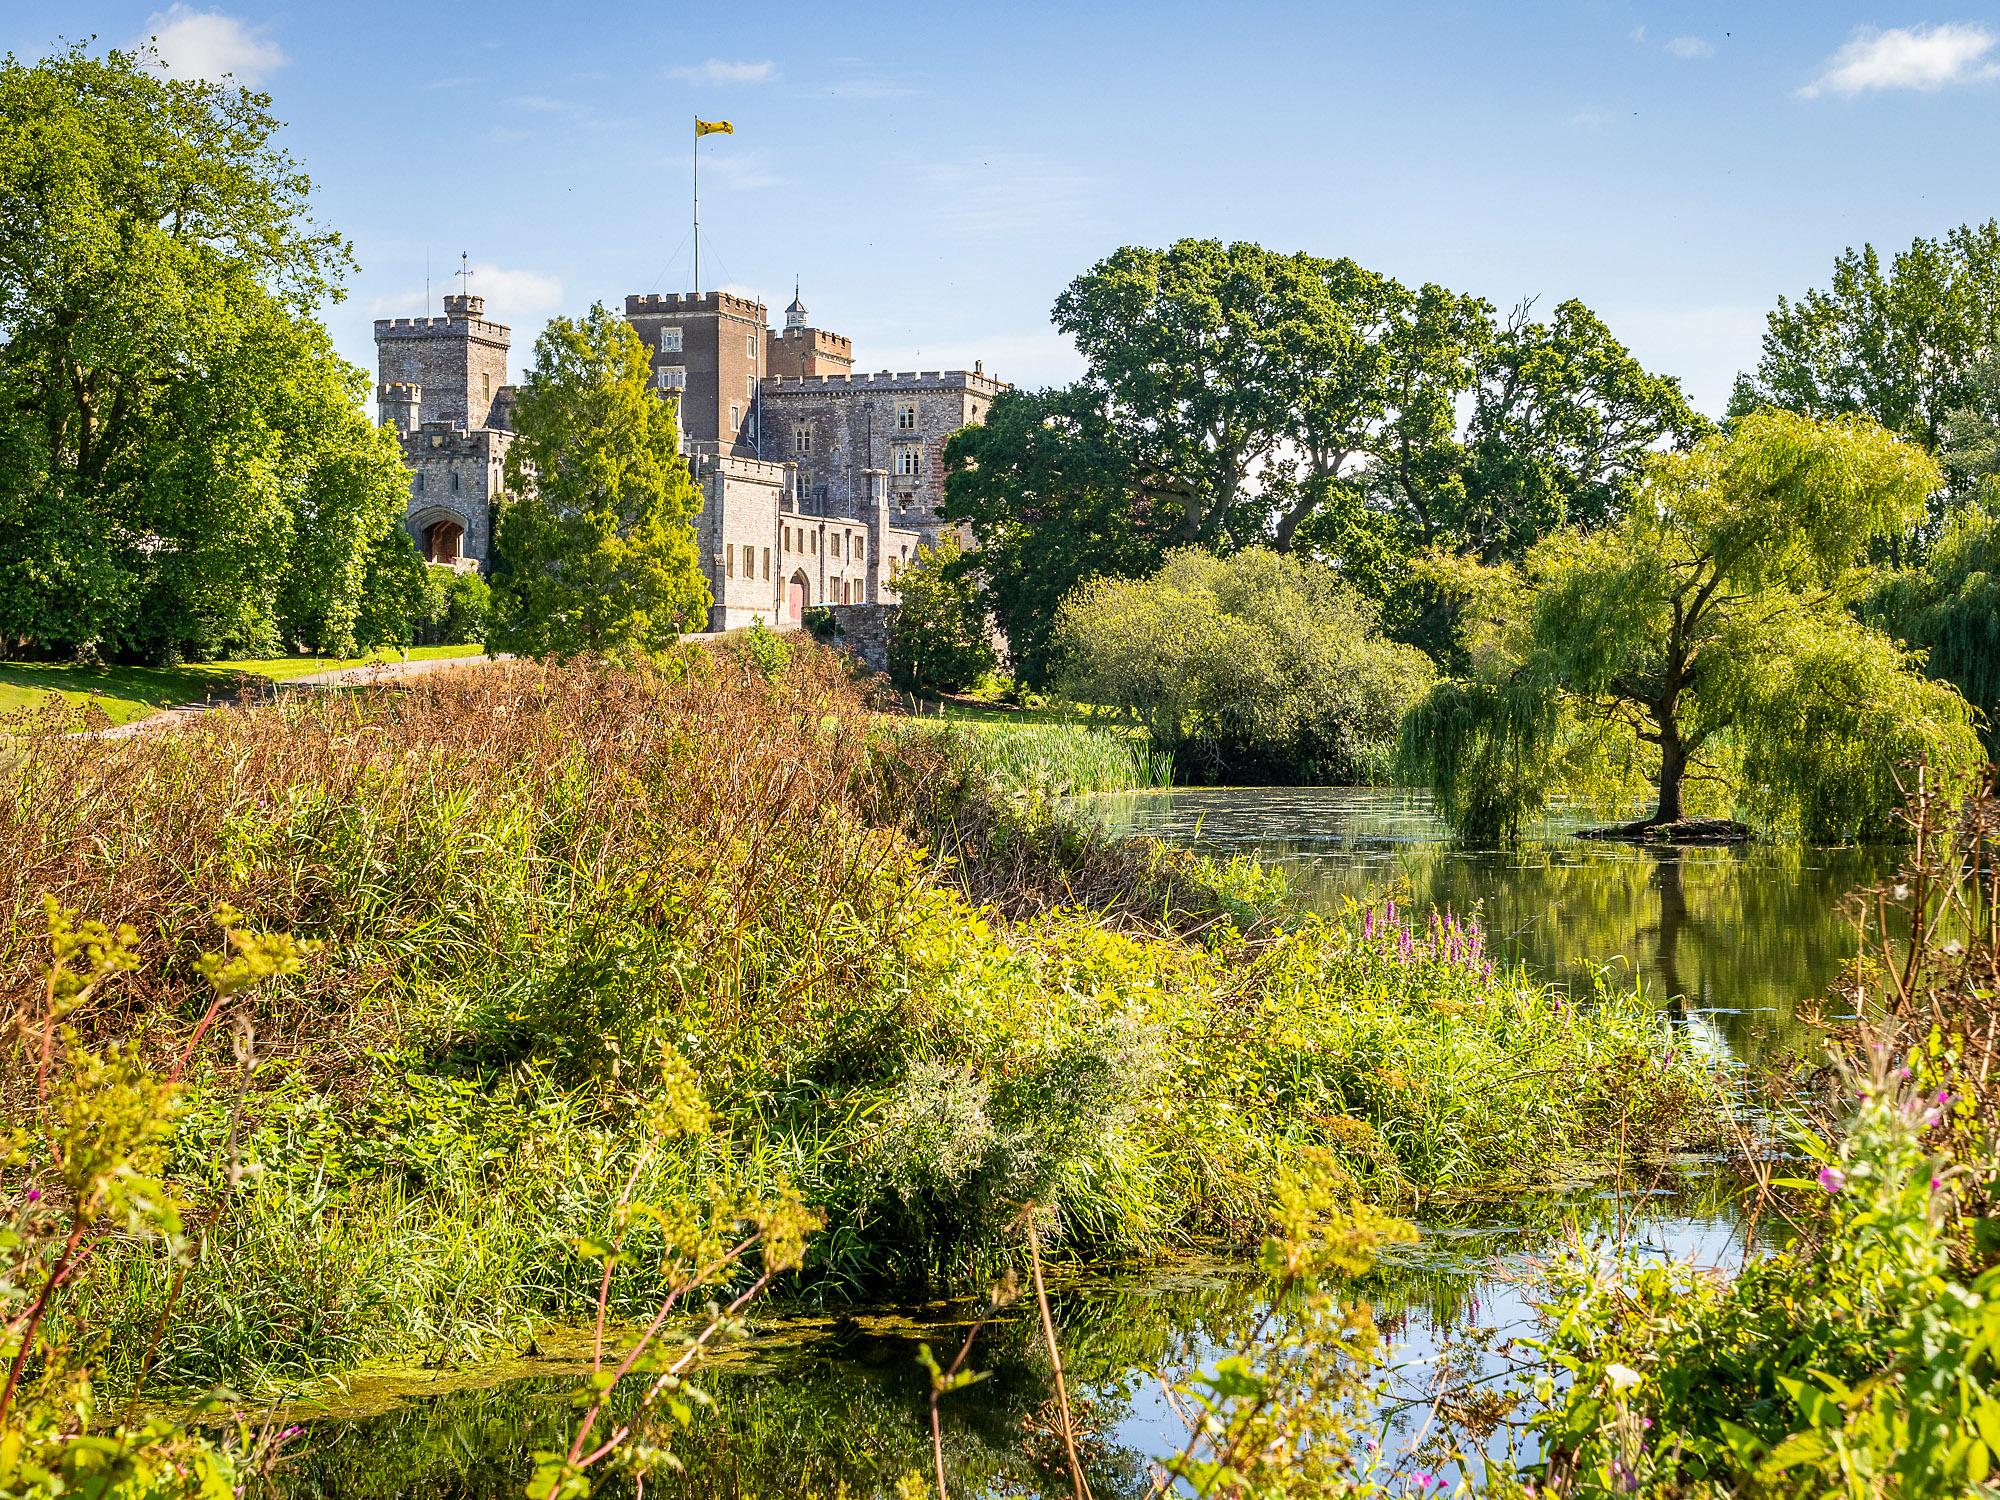 Powderham Castle, Kenton, Devon by Bob Radlinski.jpg